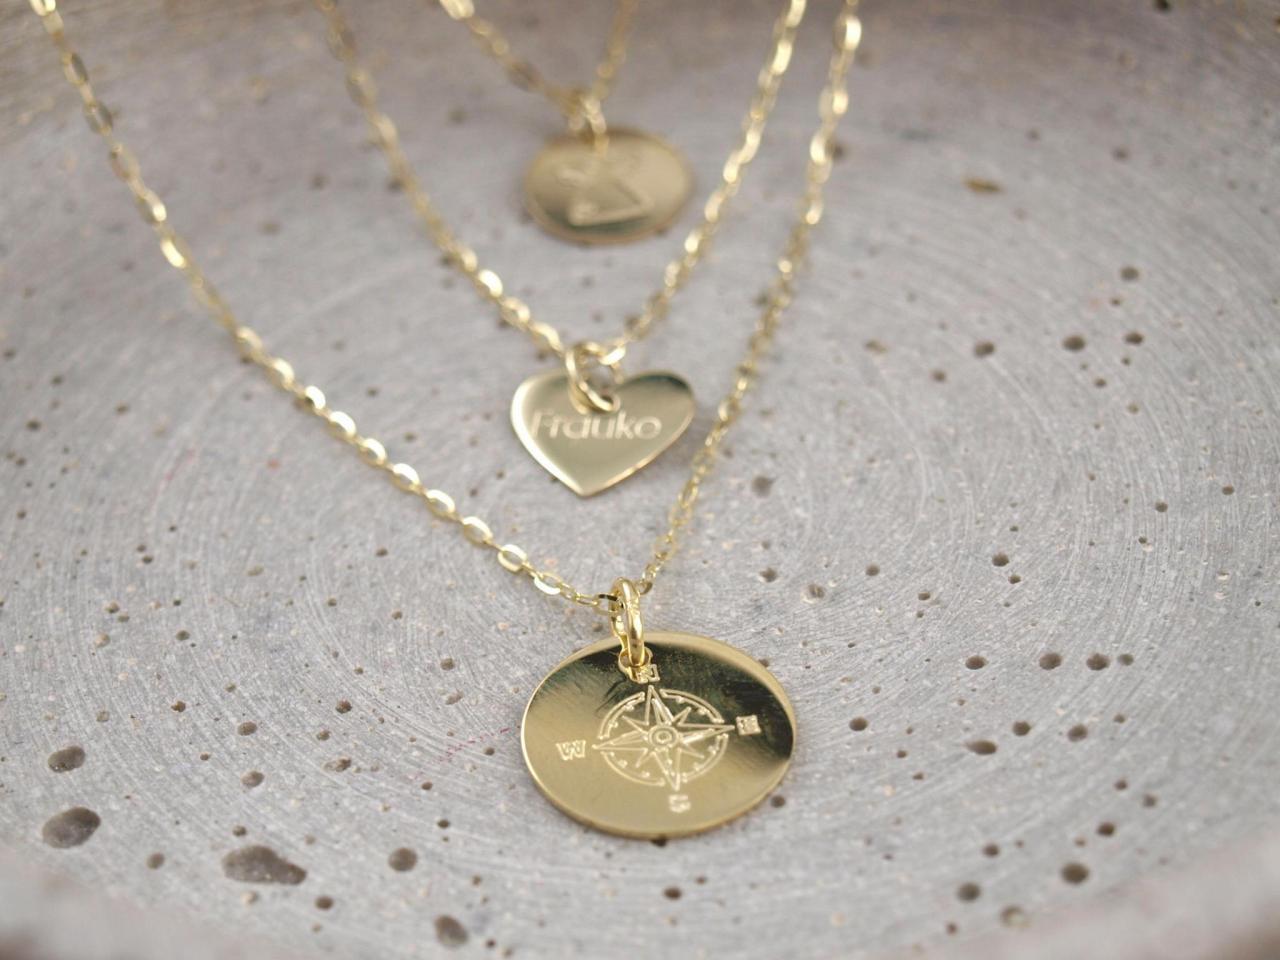 Echt goldene Ketten mit Gravur Anhaenger Kompass Herz